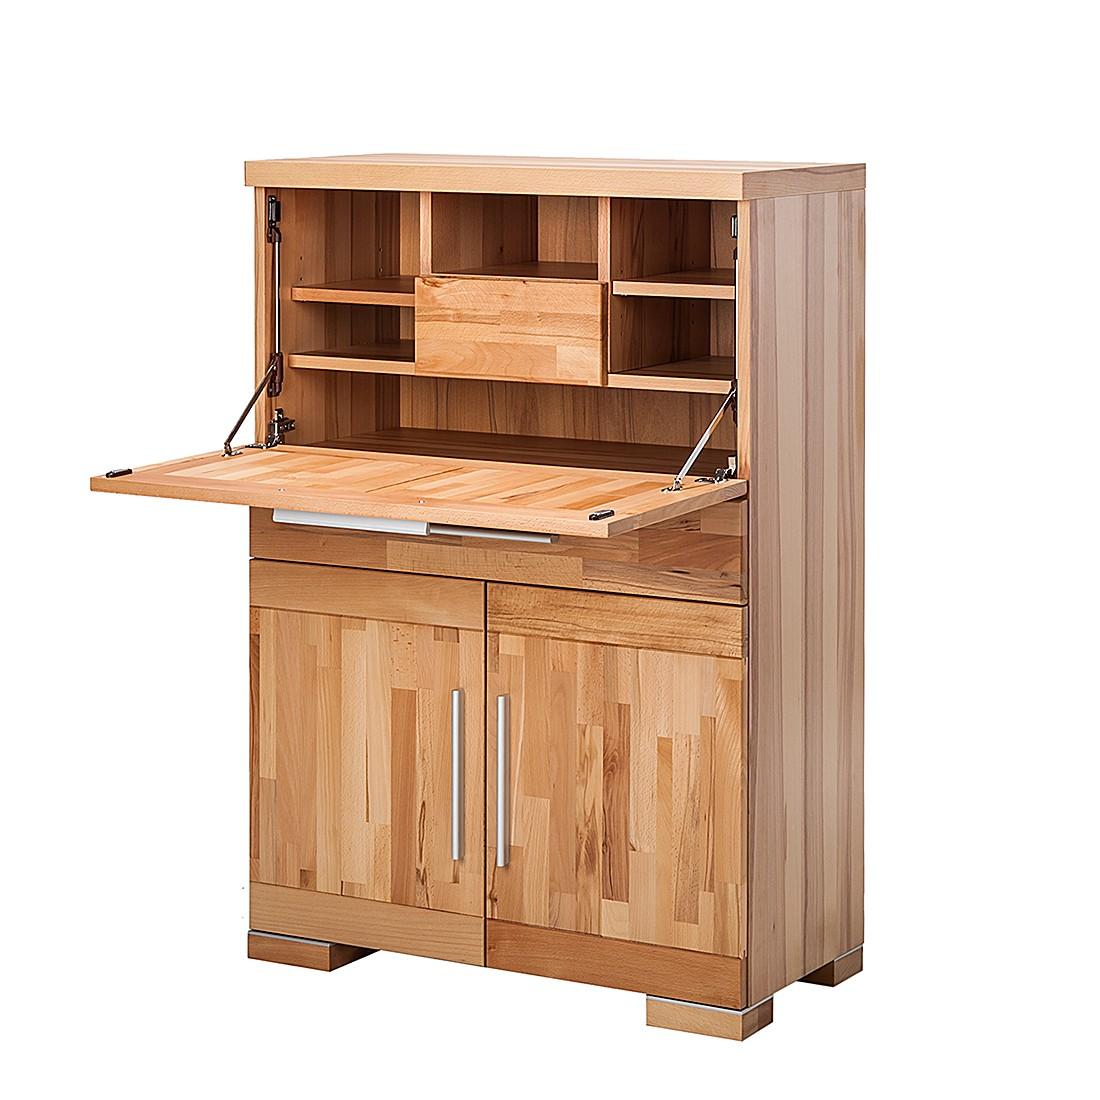 schreibsekret r laterza kernbuche teilmassiv ars natura. Black Bedroom Furniture Sets. Home Design Ideas